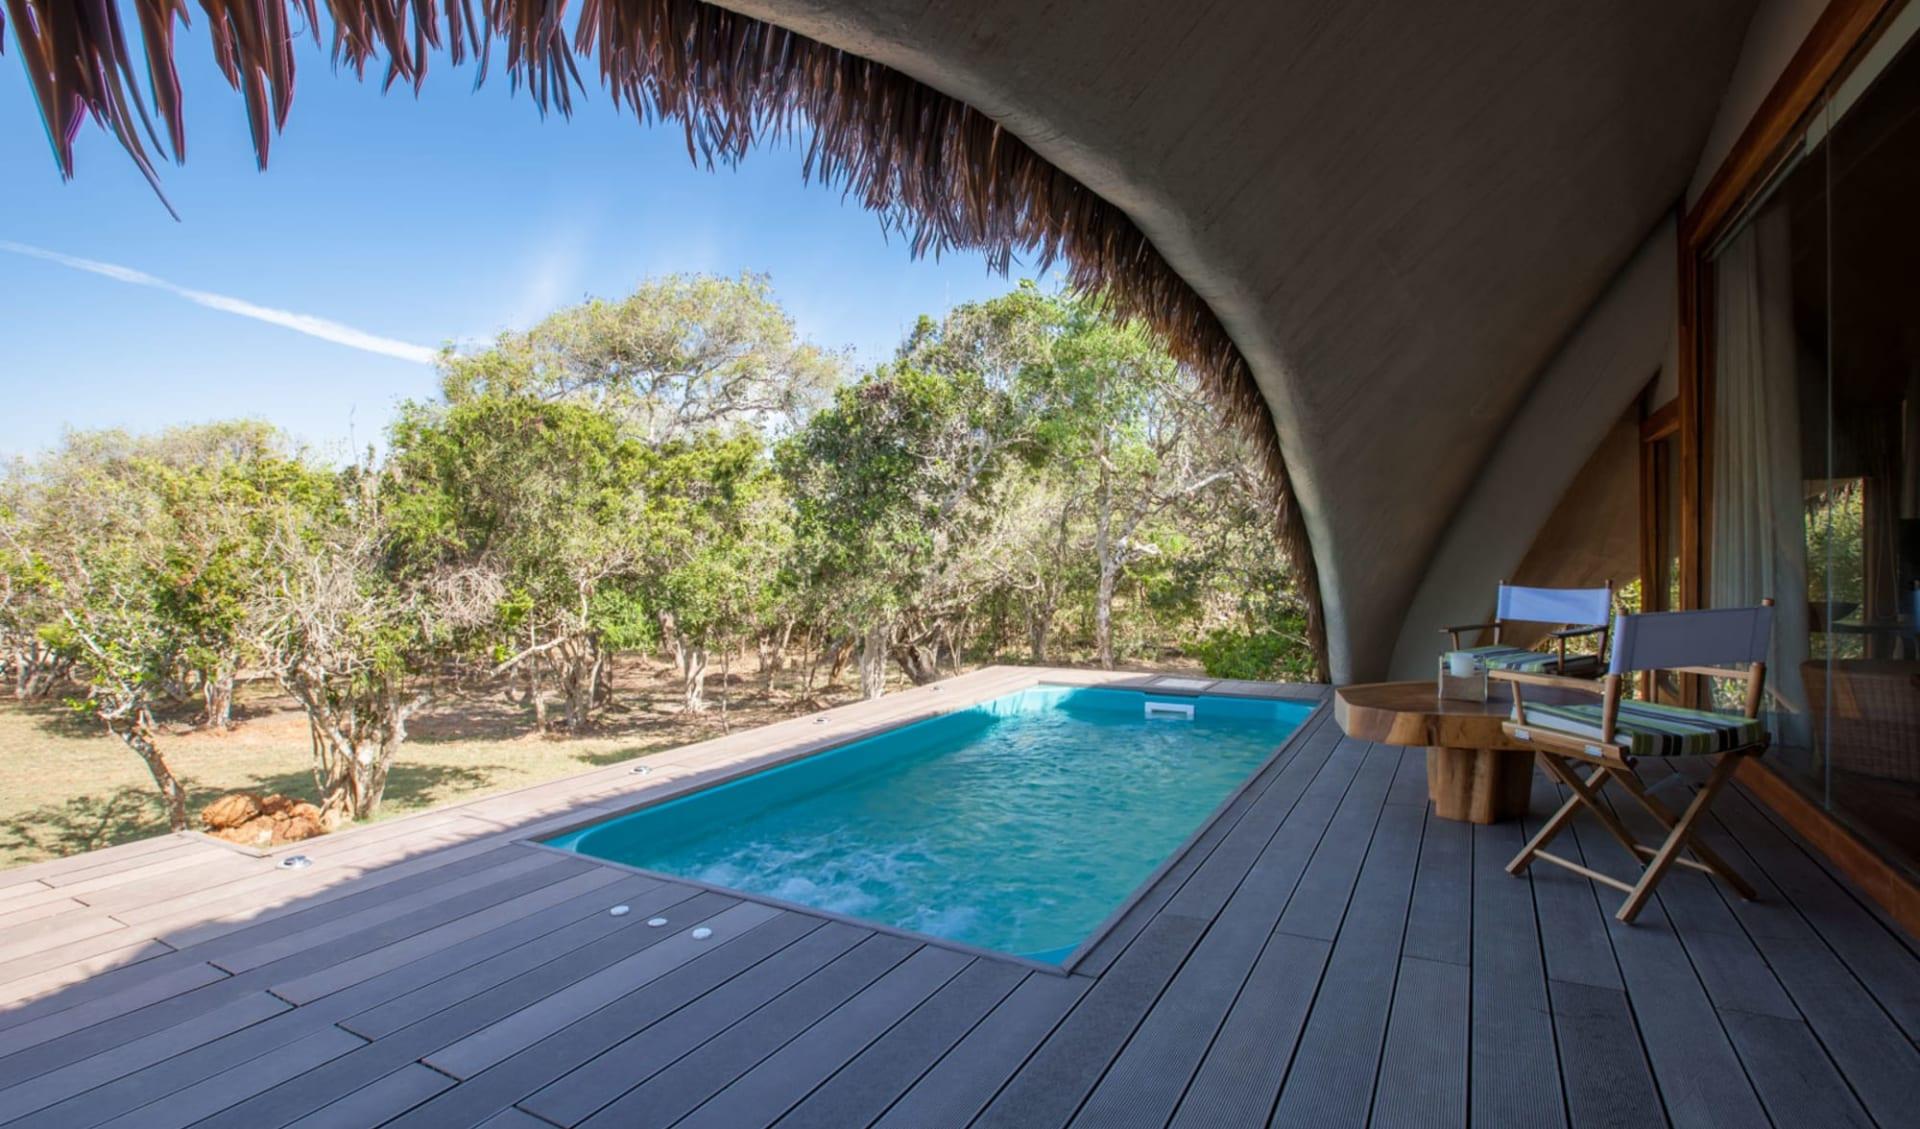 Yala Nationalpark Safari - Chena Huts - 3 Tage ab Colombo: room: Plunge Pool and Deck of Cabin